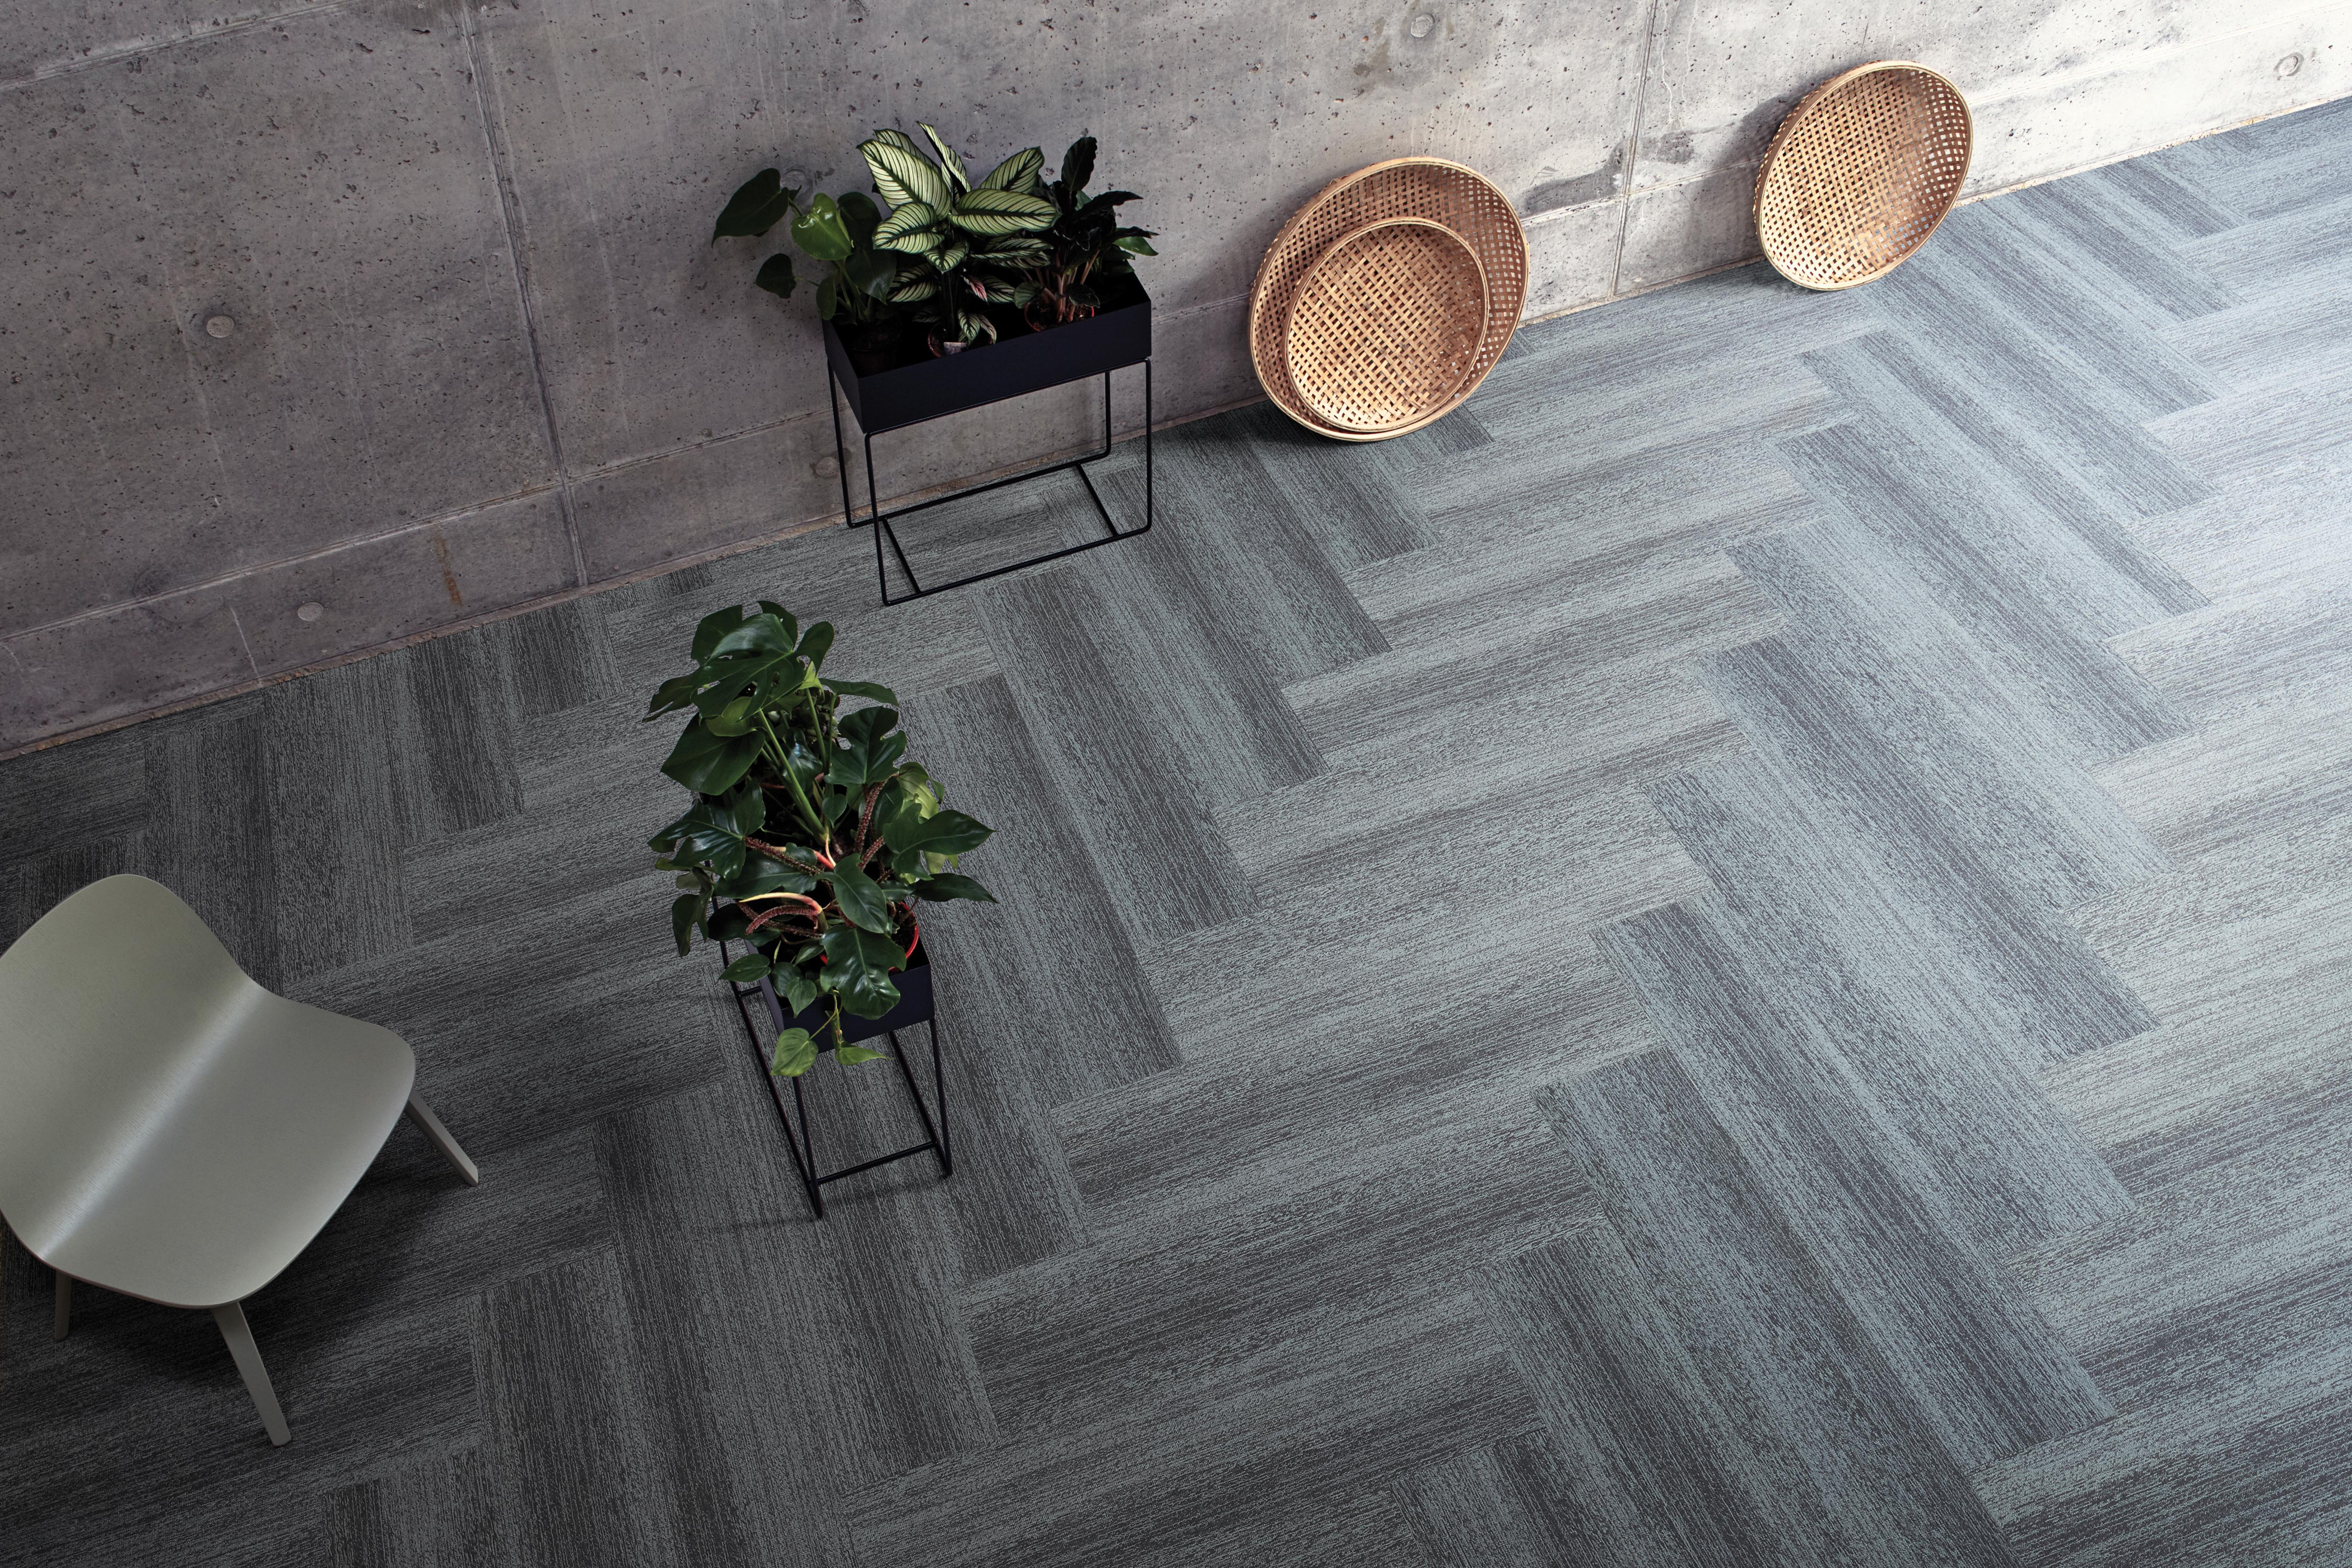 Carpet tile set in herringbone.